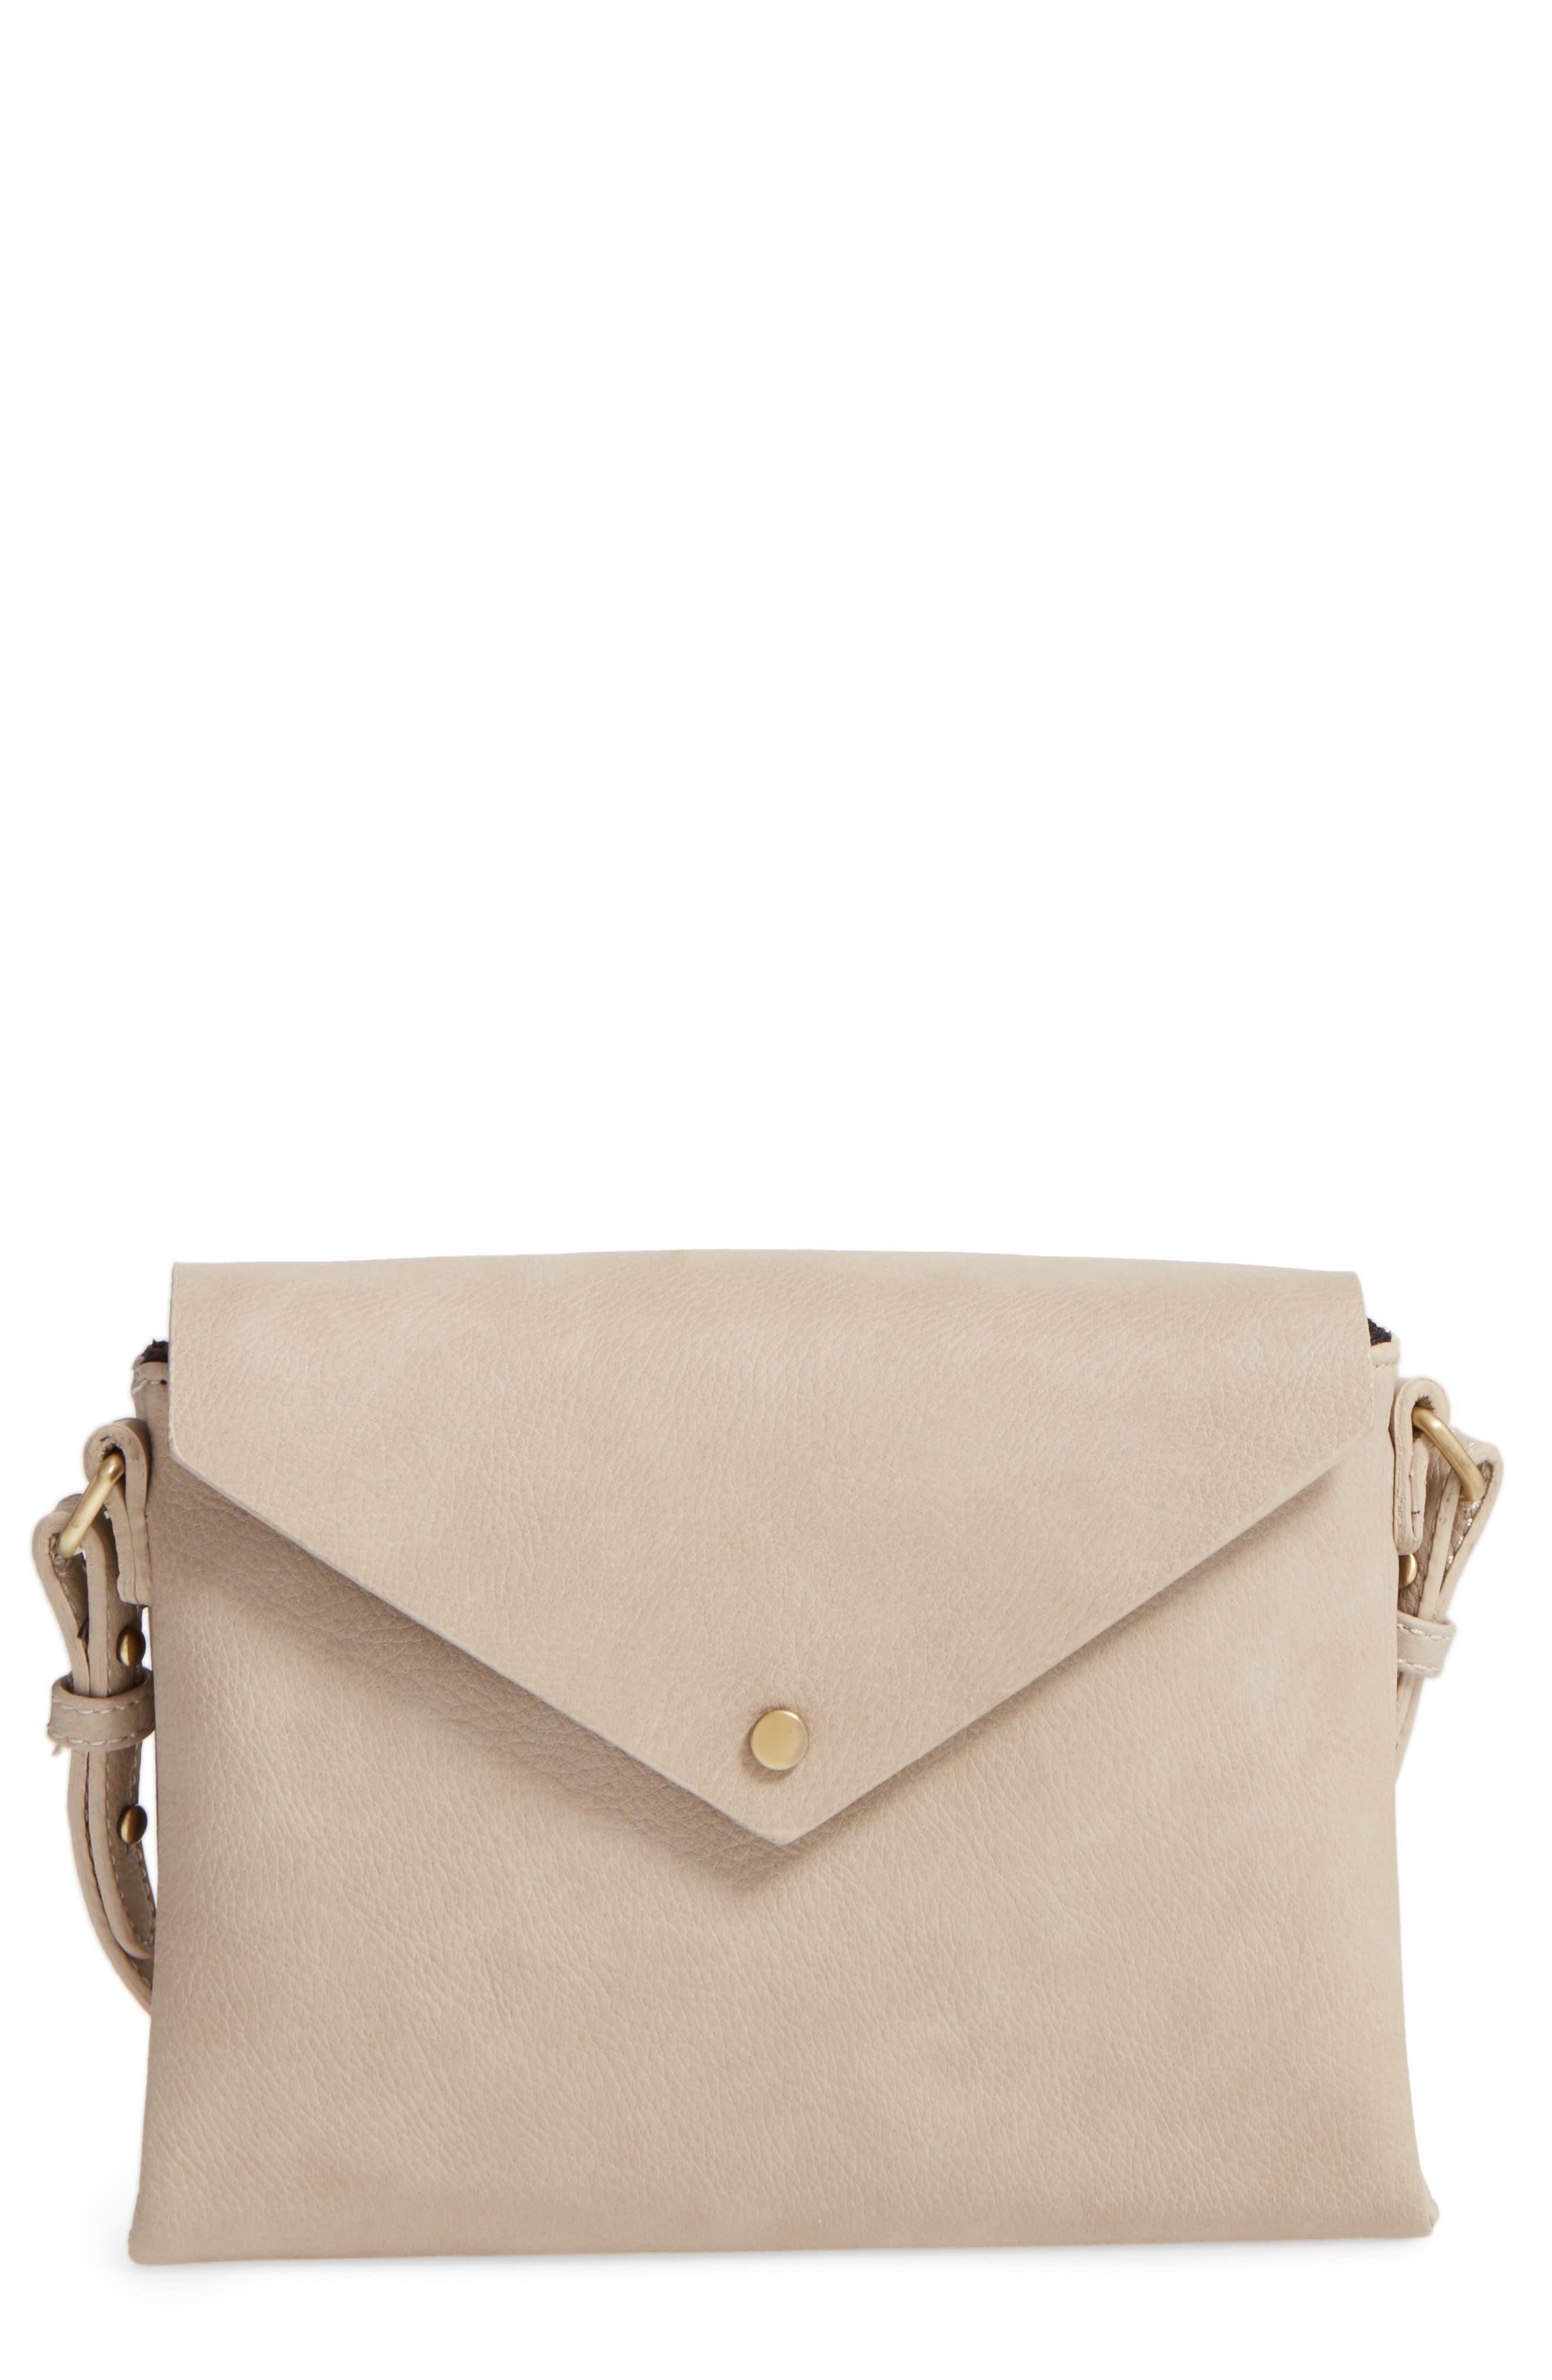 Main Image - Street Level Faux Leather Envelope Crossbody Bag